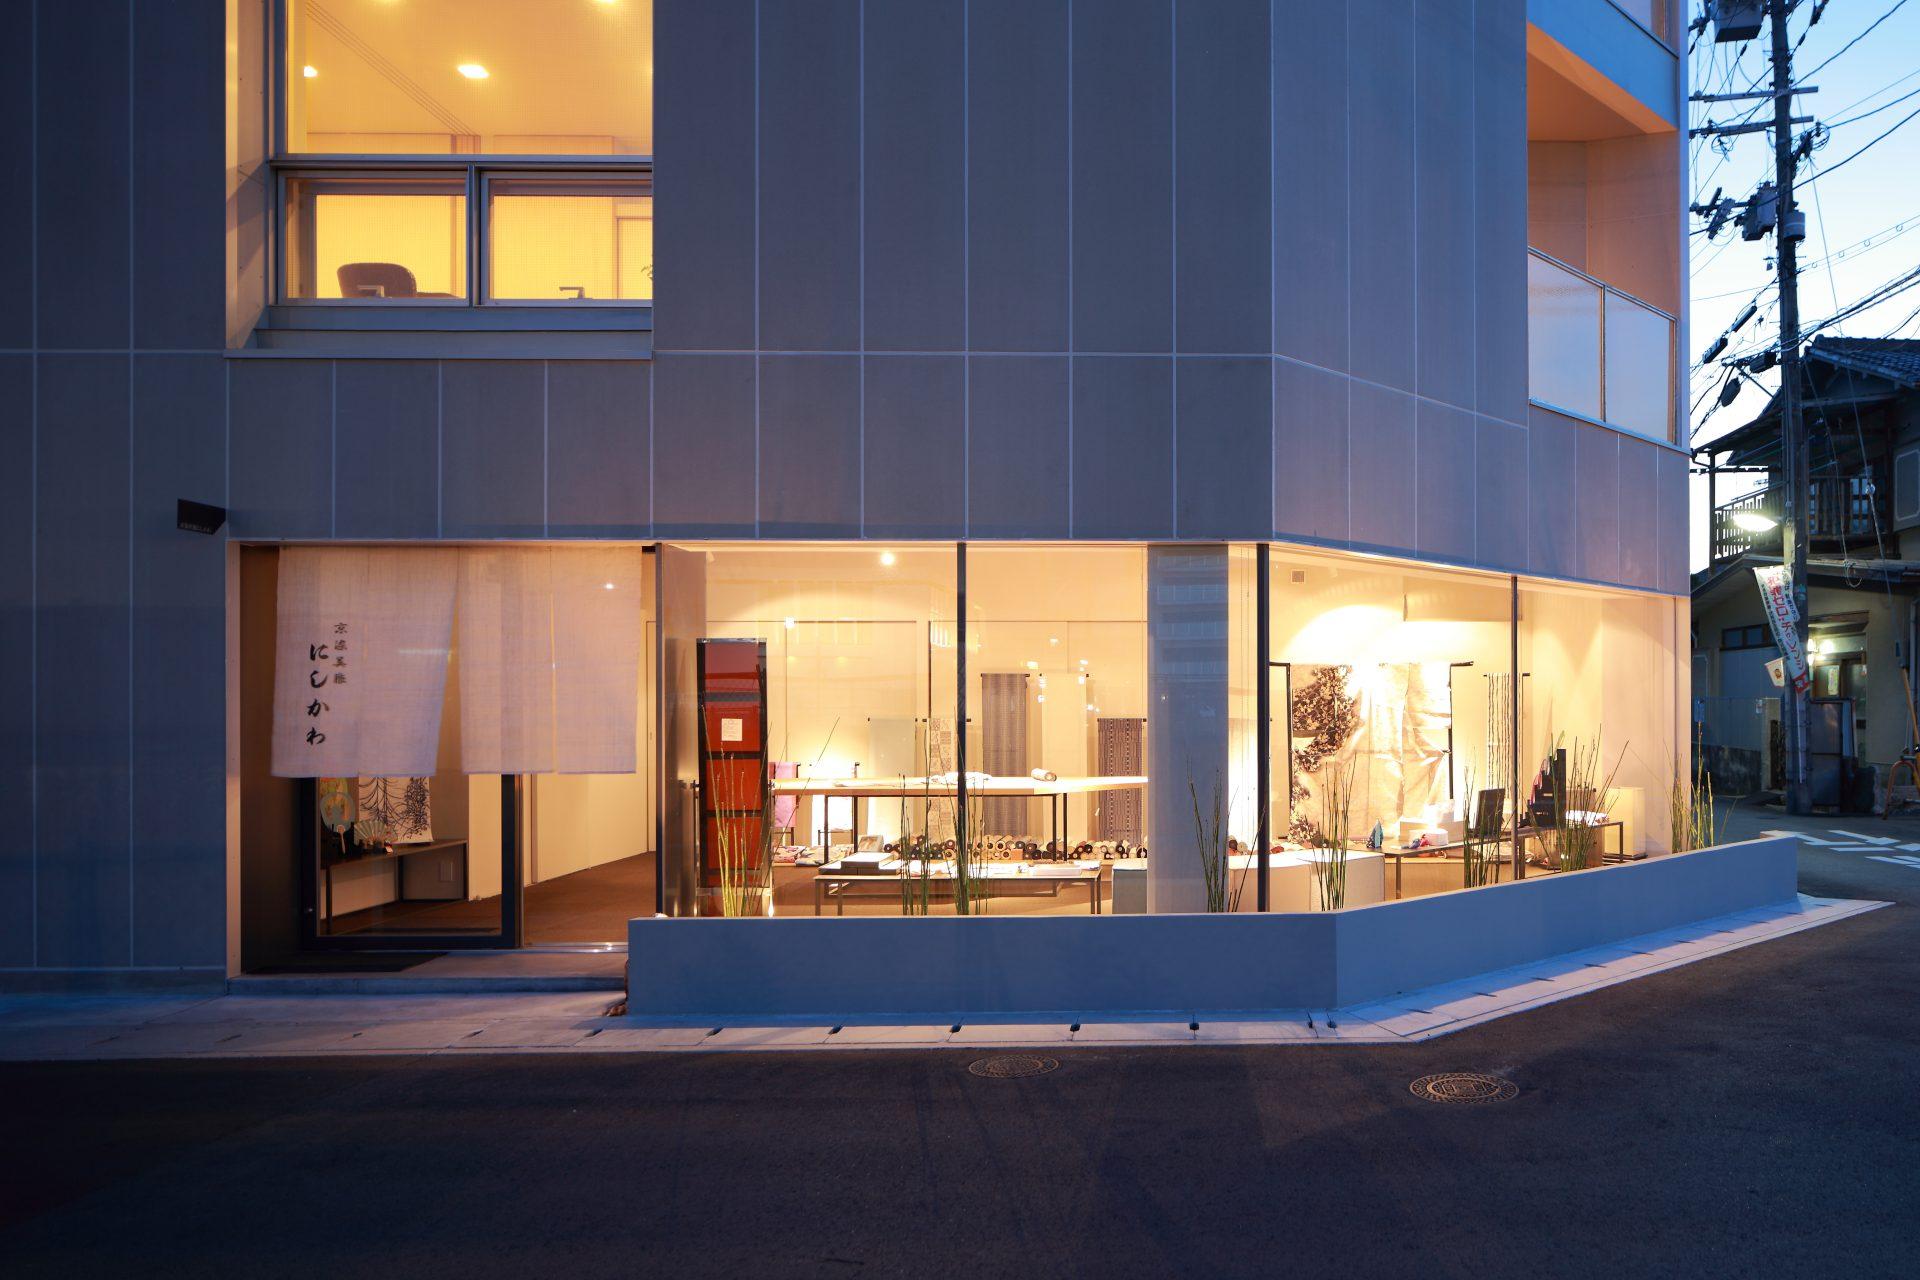 奈良西大寺の店舗+住宅の外観(夜景)02